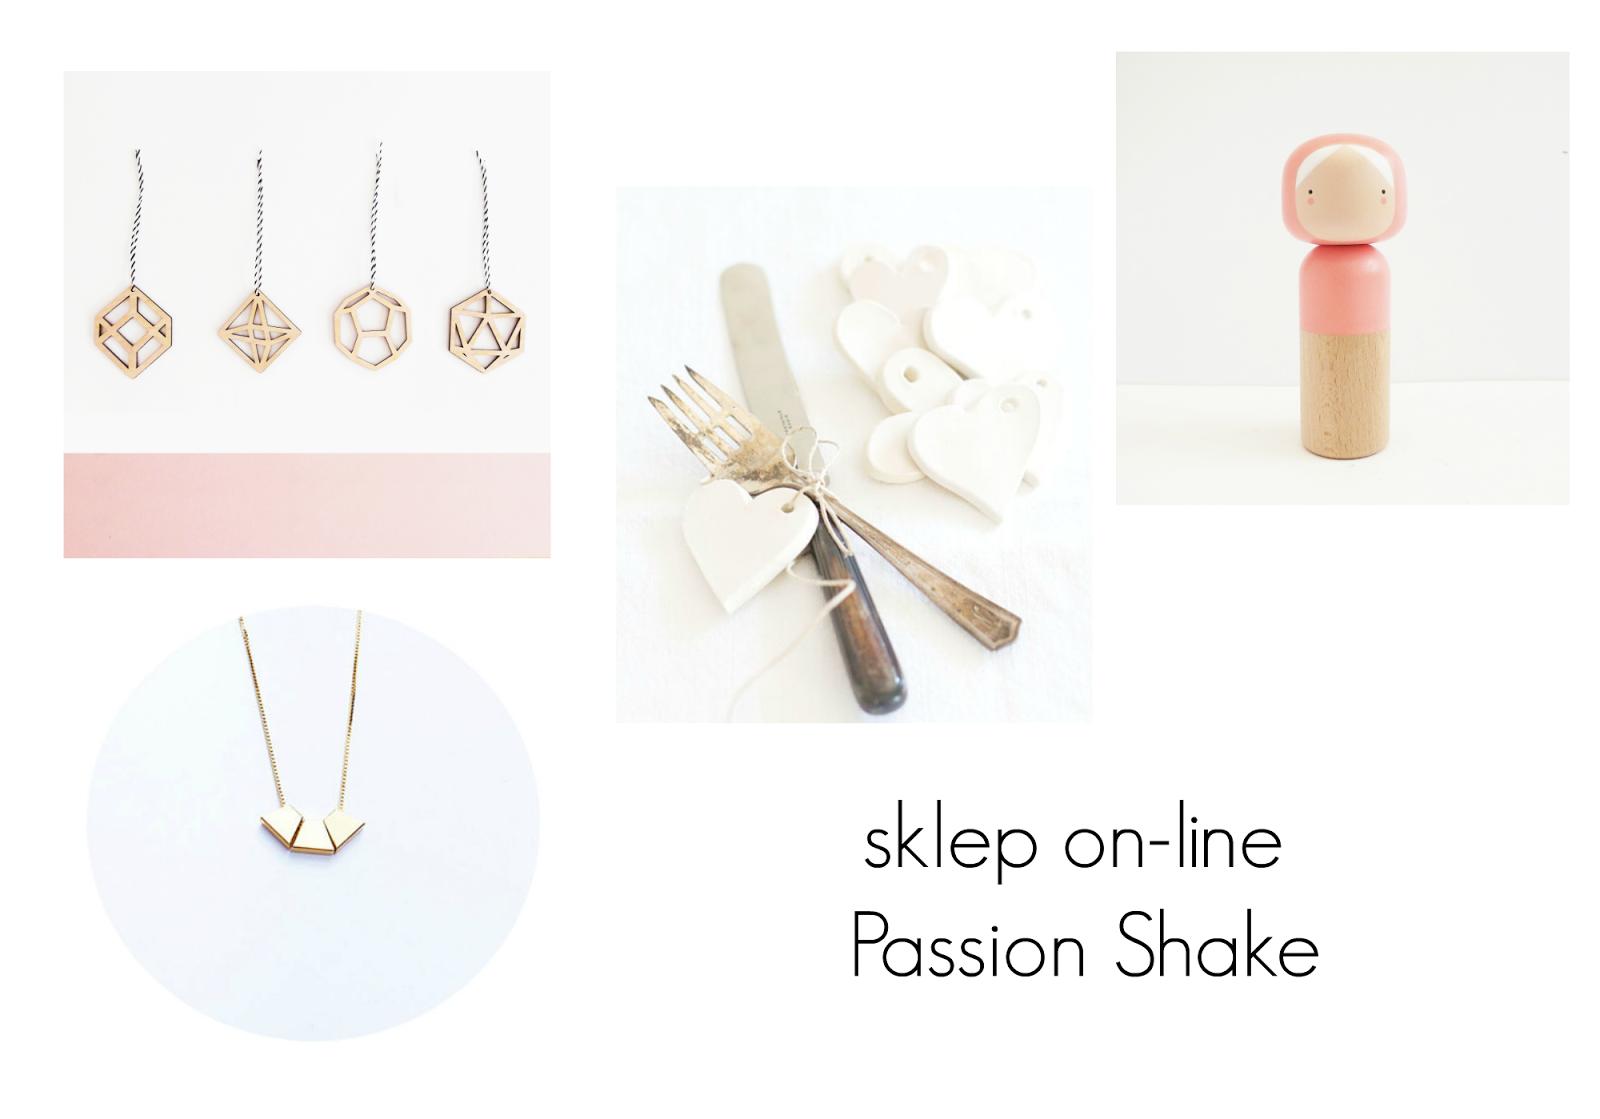 sklep passion shake